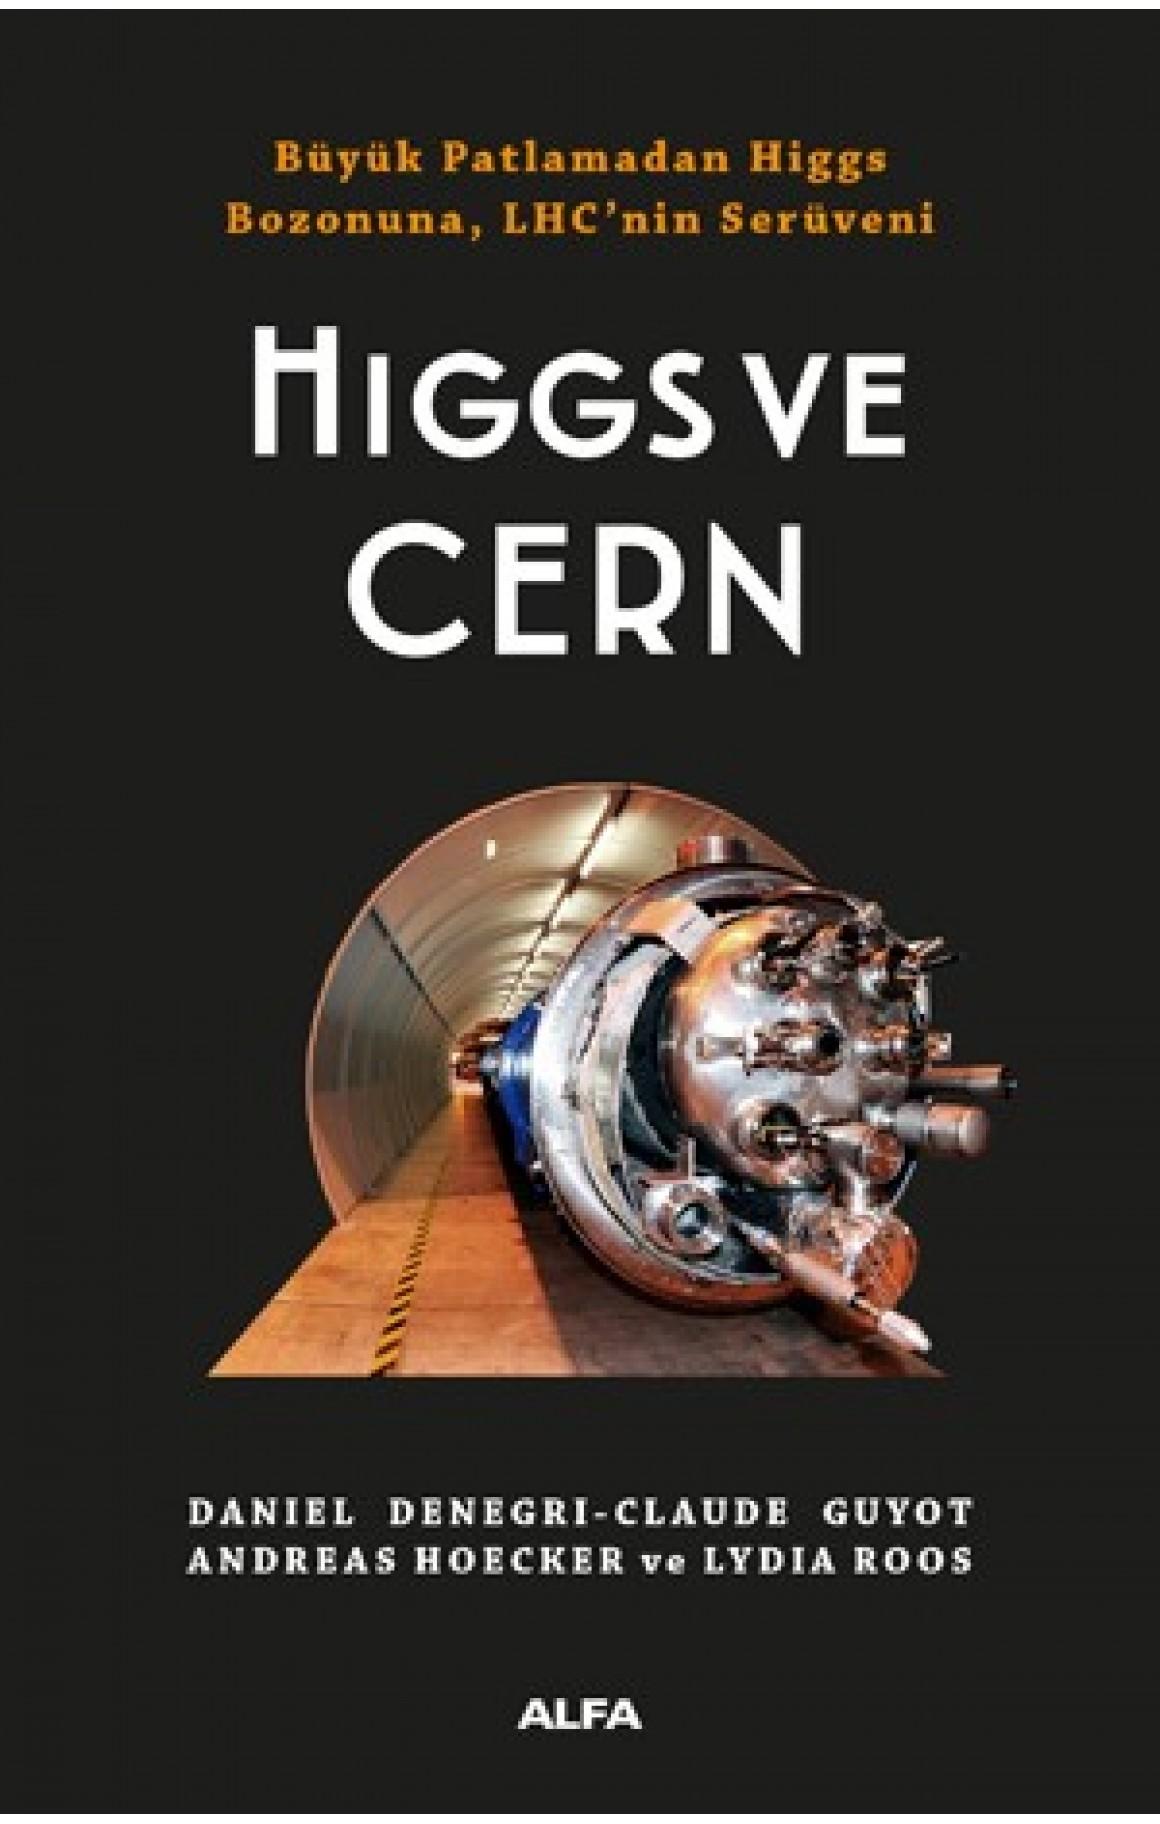 Higgs ve Cern - Büyük Patlamadan Higgs Bozonuna, LHCnin Serüveni